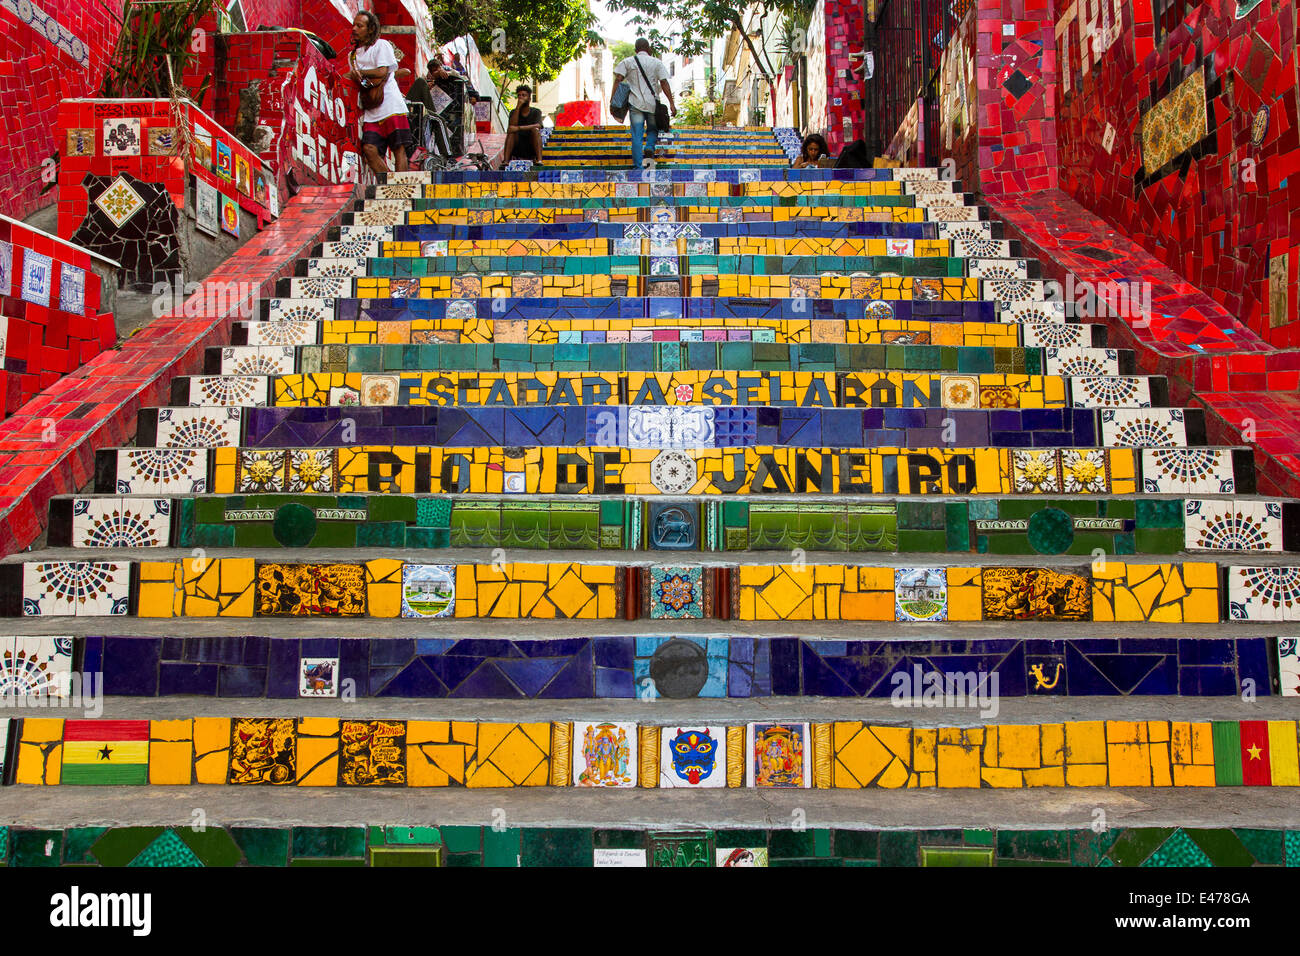 Selaron´s steps at the Lapa neighborhood. The colorful masterpiece of the chilean atist Jorge Selaron - Stock Image